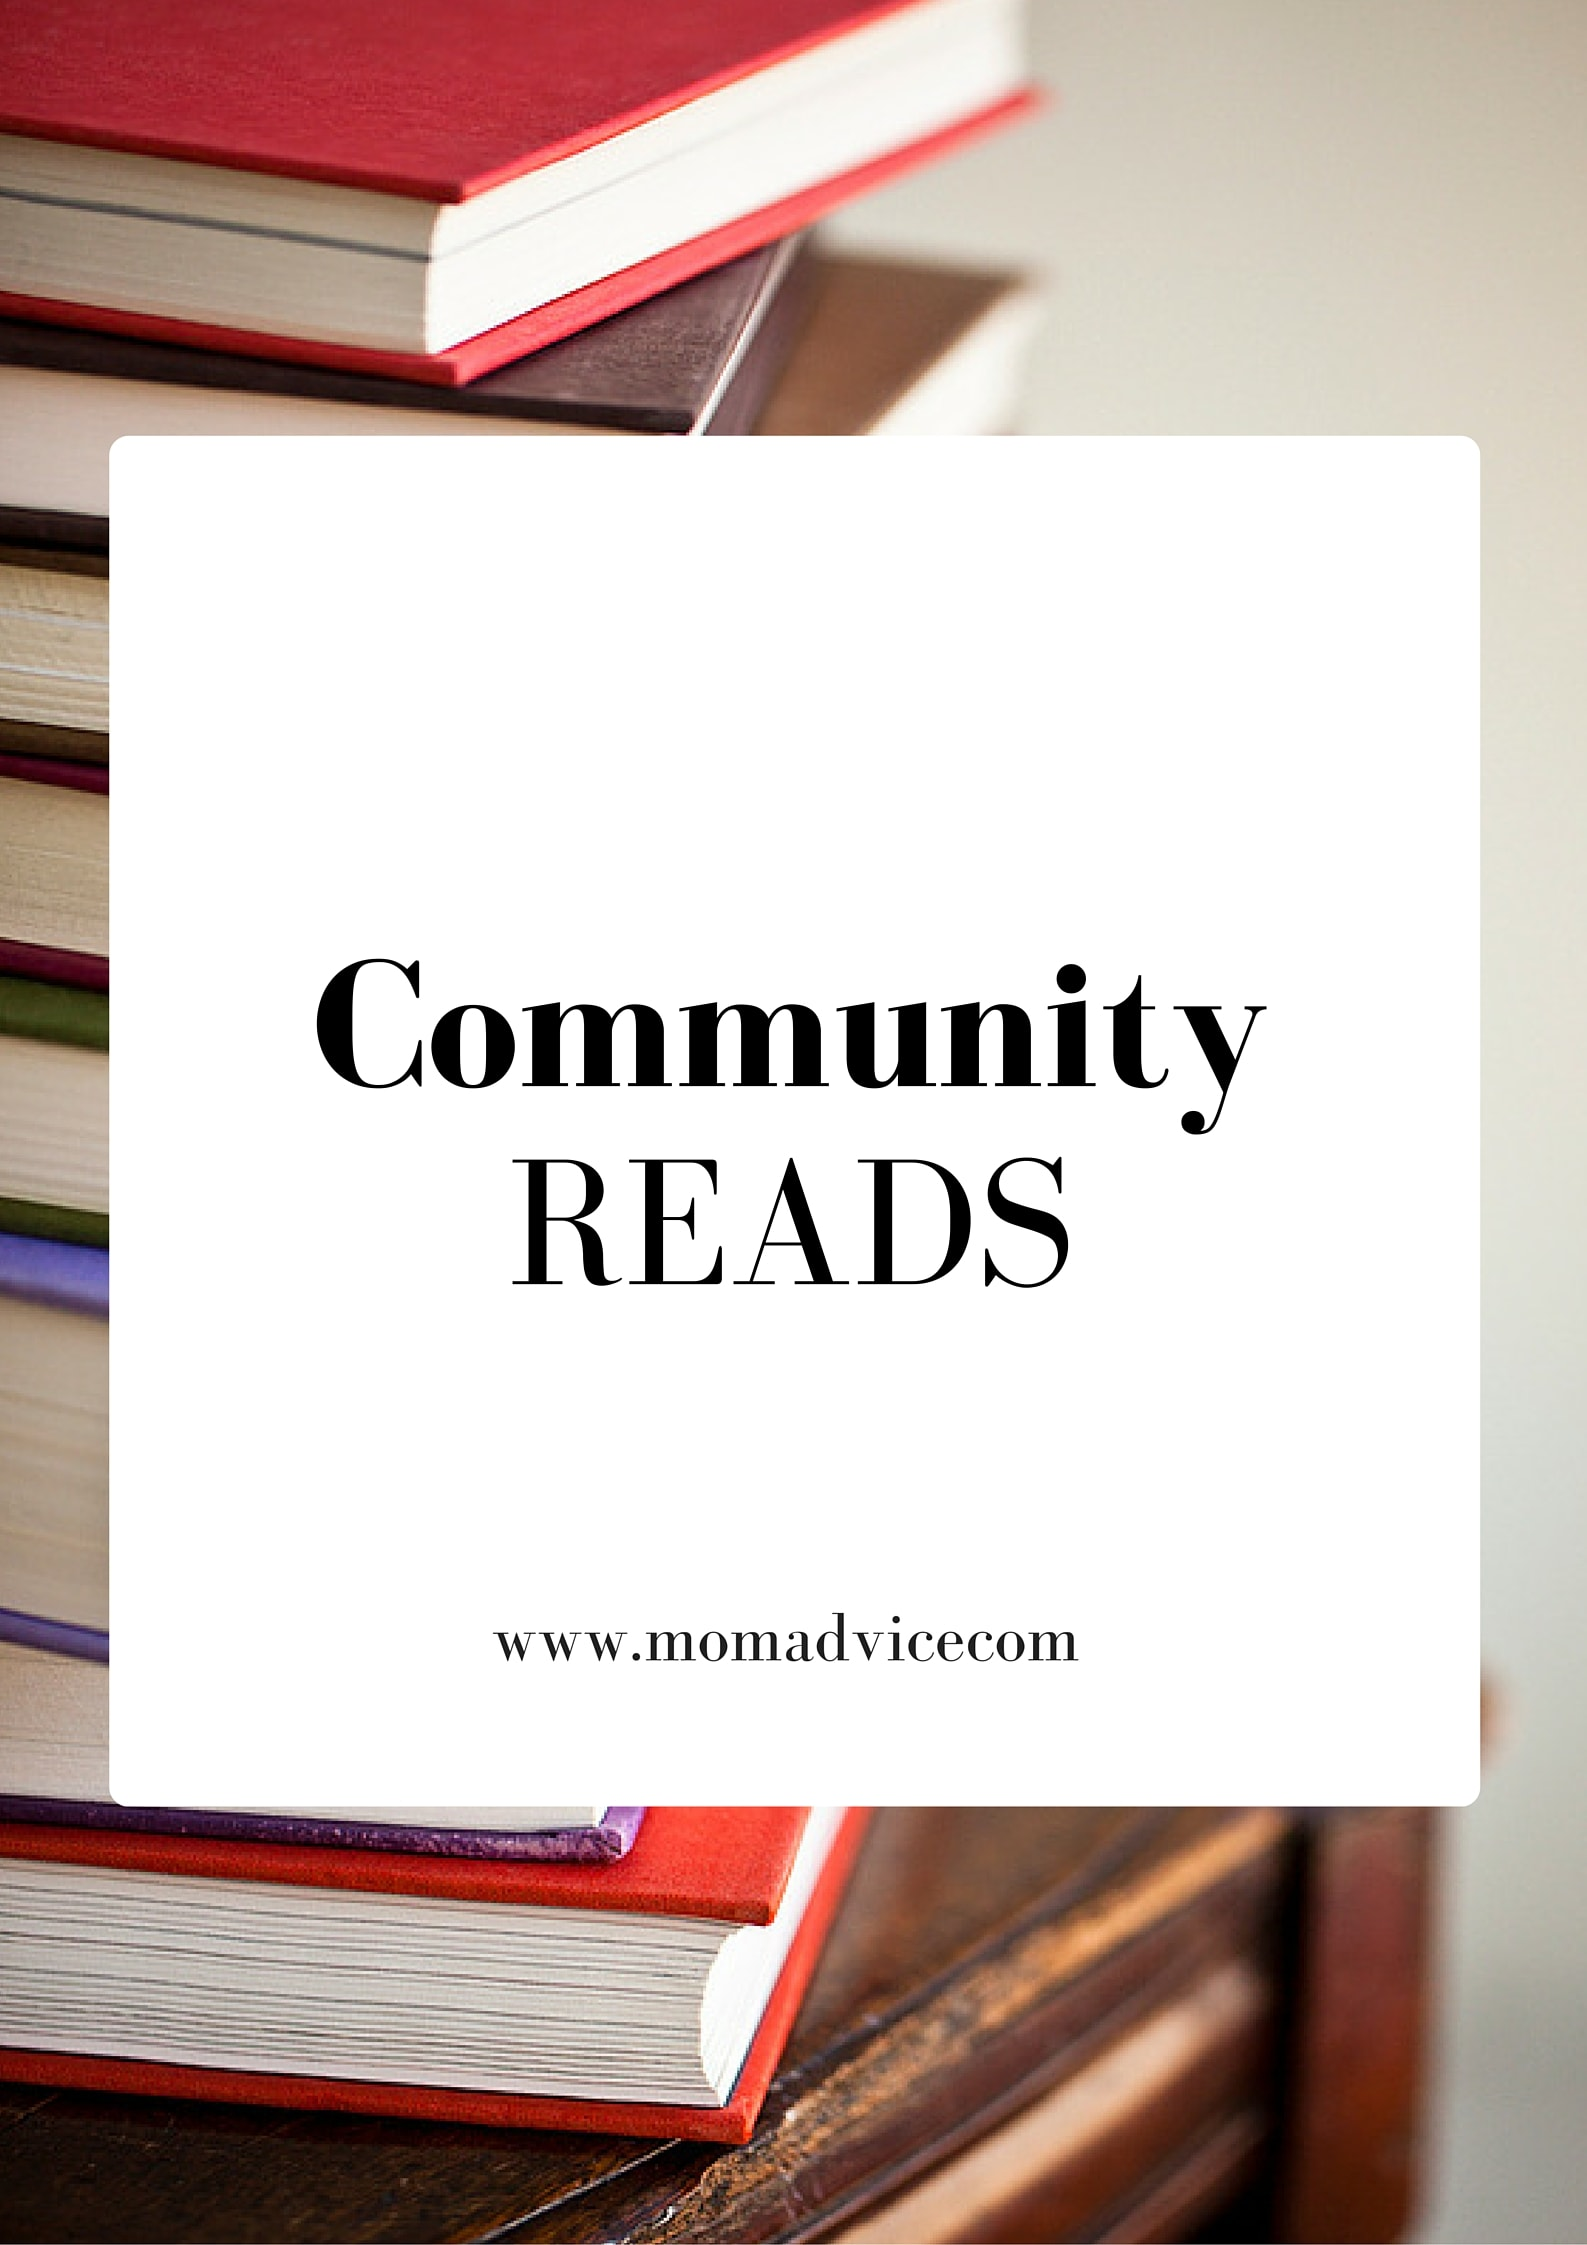 Community (1)